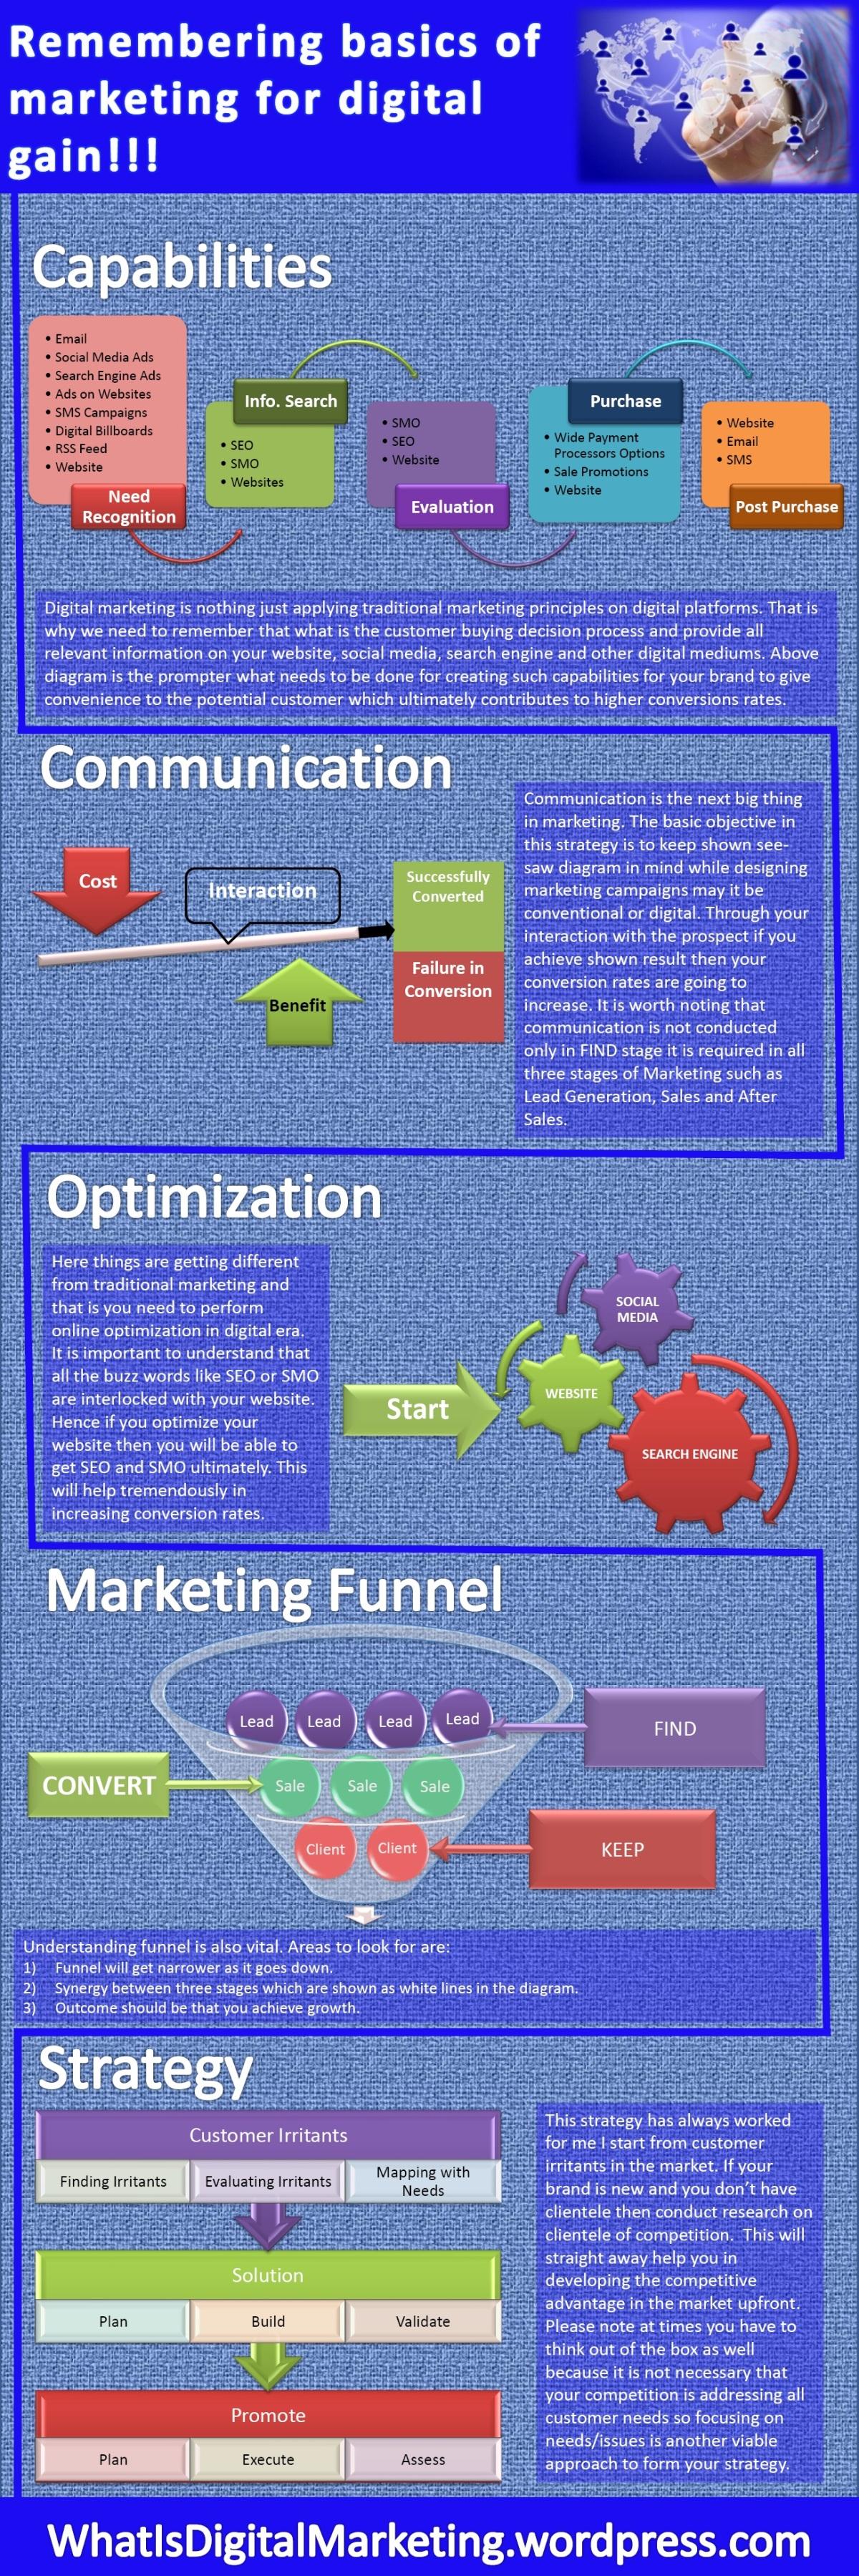 Remembering basics of marketing for digital gain | Digital Marketing